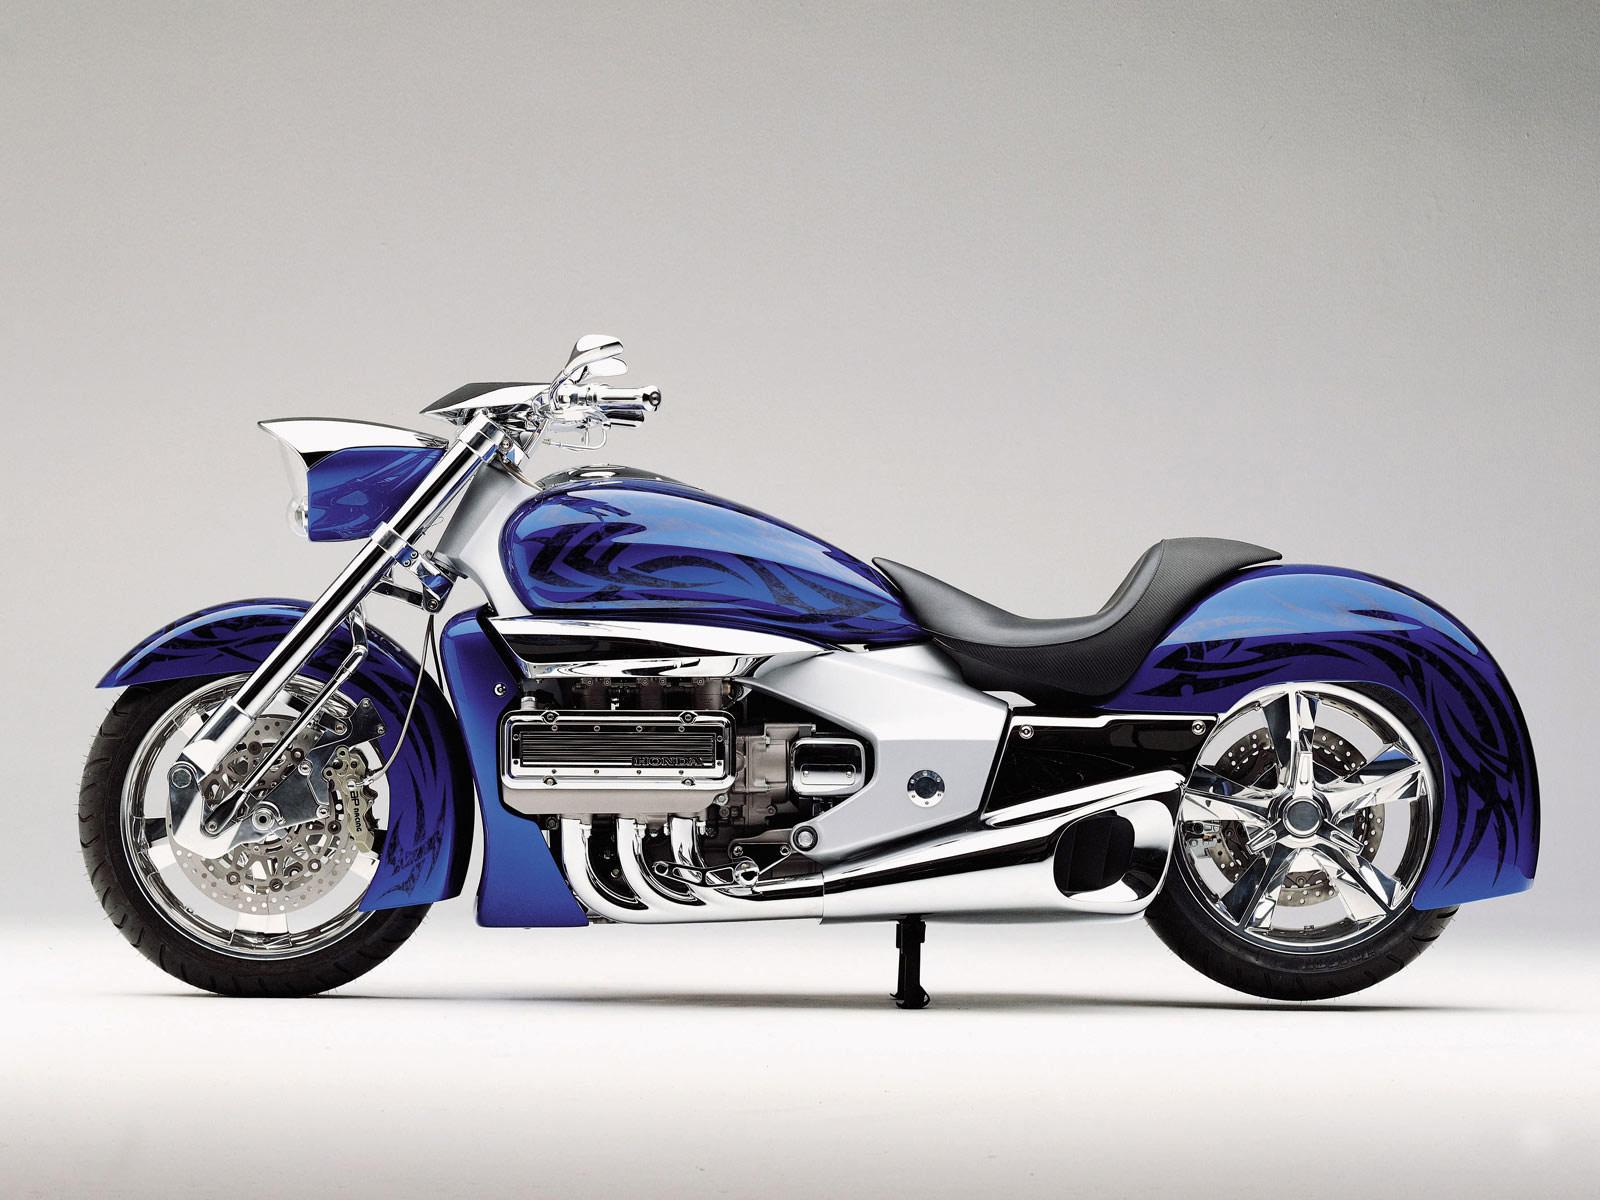 http://1.bp.blogspot.com/-pqIyidojYao/TiUPAonnwvI/AAAAAAAAAKI/Kxo8g4bSf2s/s1600/honda_T2_Concept_2000_car-desktop-wallpaper_01.jpg